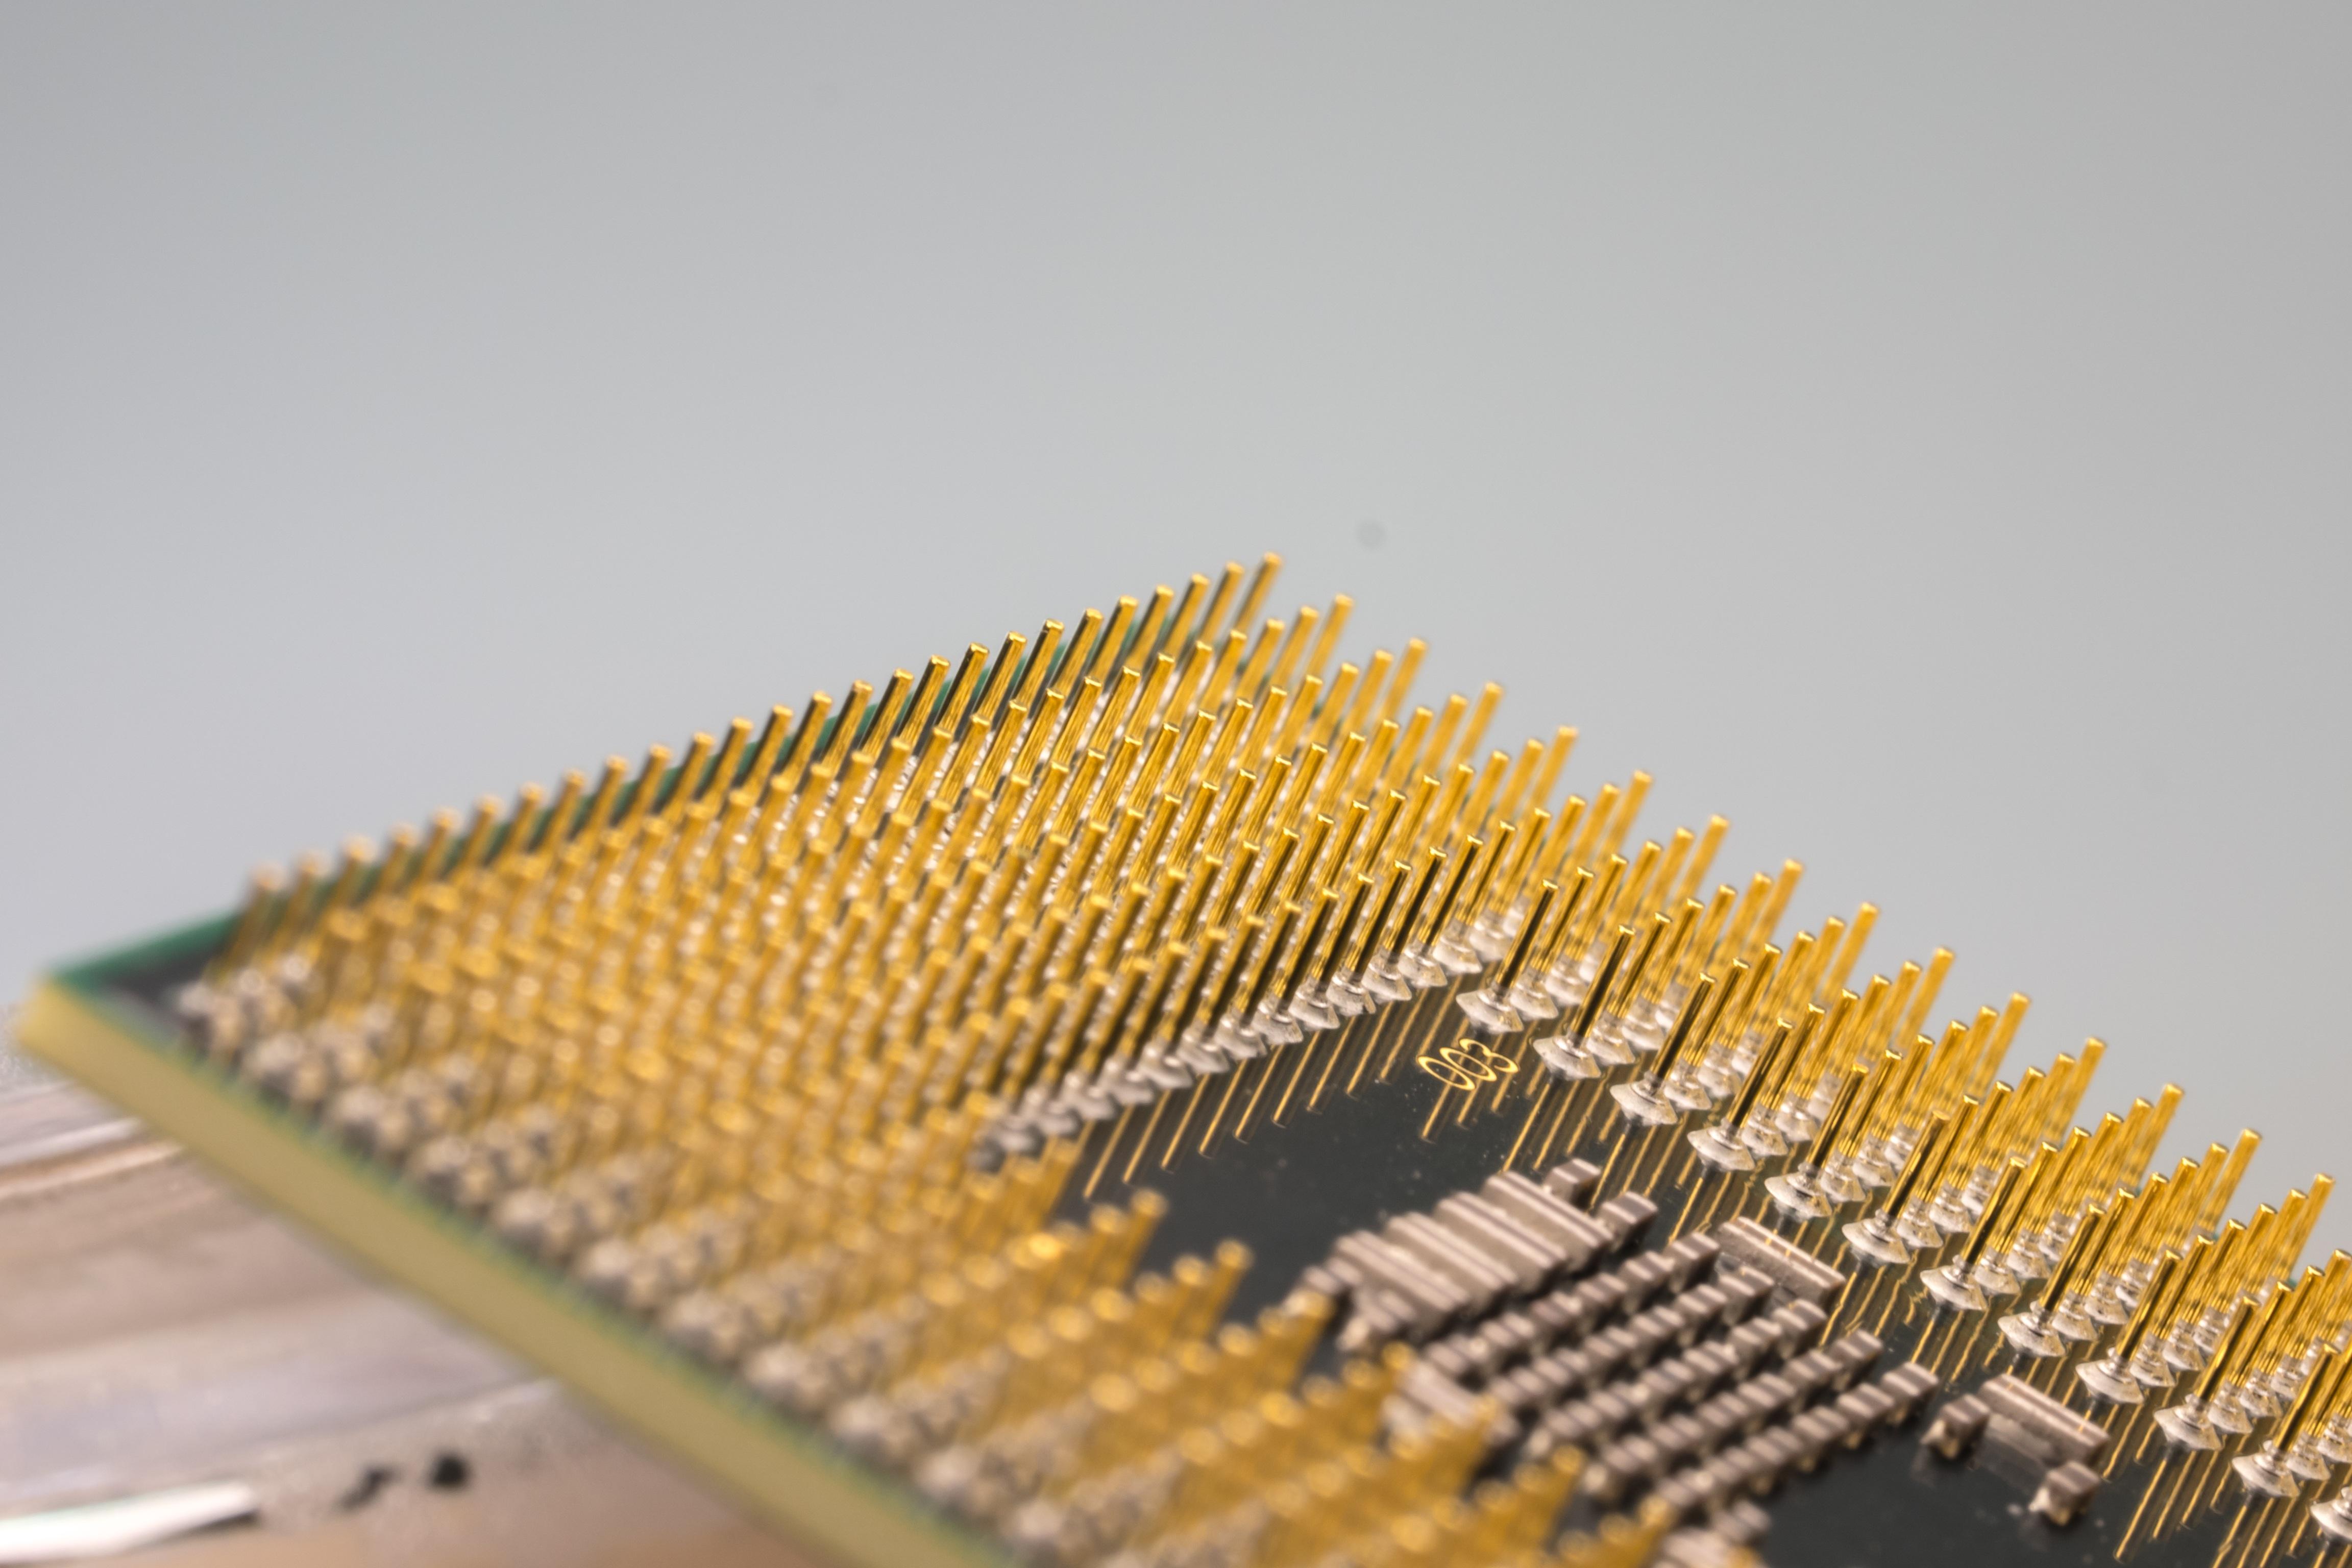 Free Images Board Technology Pen Line Macro Yellow Close Circuit Electronic Wallpaper 1920x1200 Arts Trace Art Pin Electronics Components Pc Software Slot Calculator Circuits